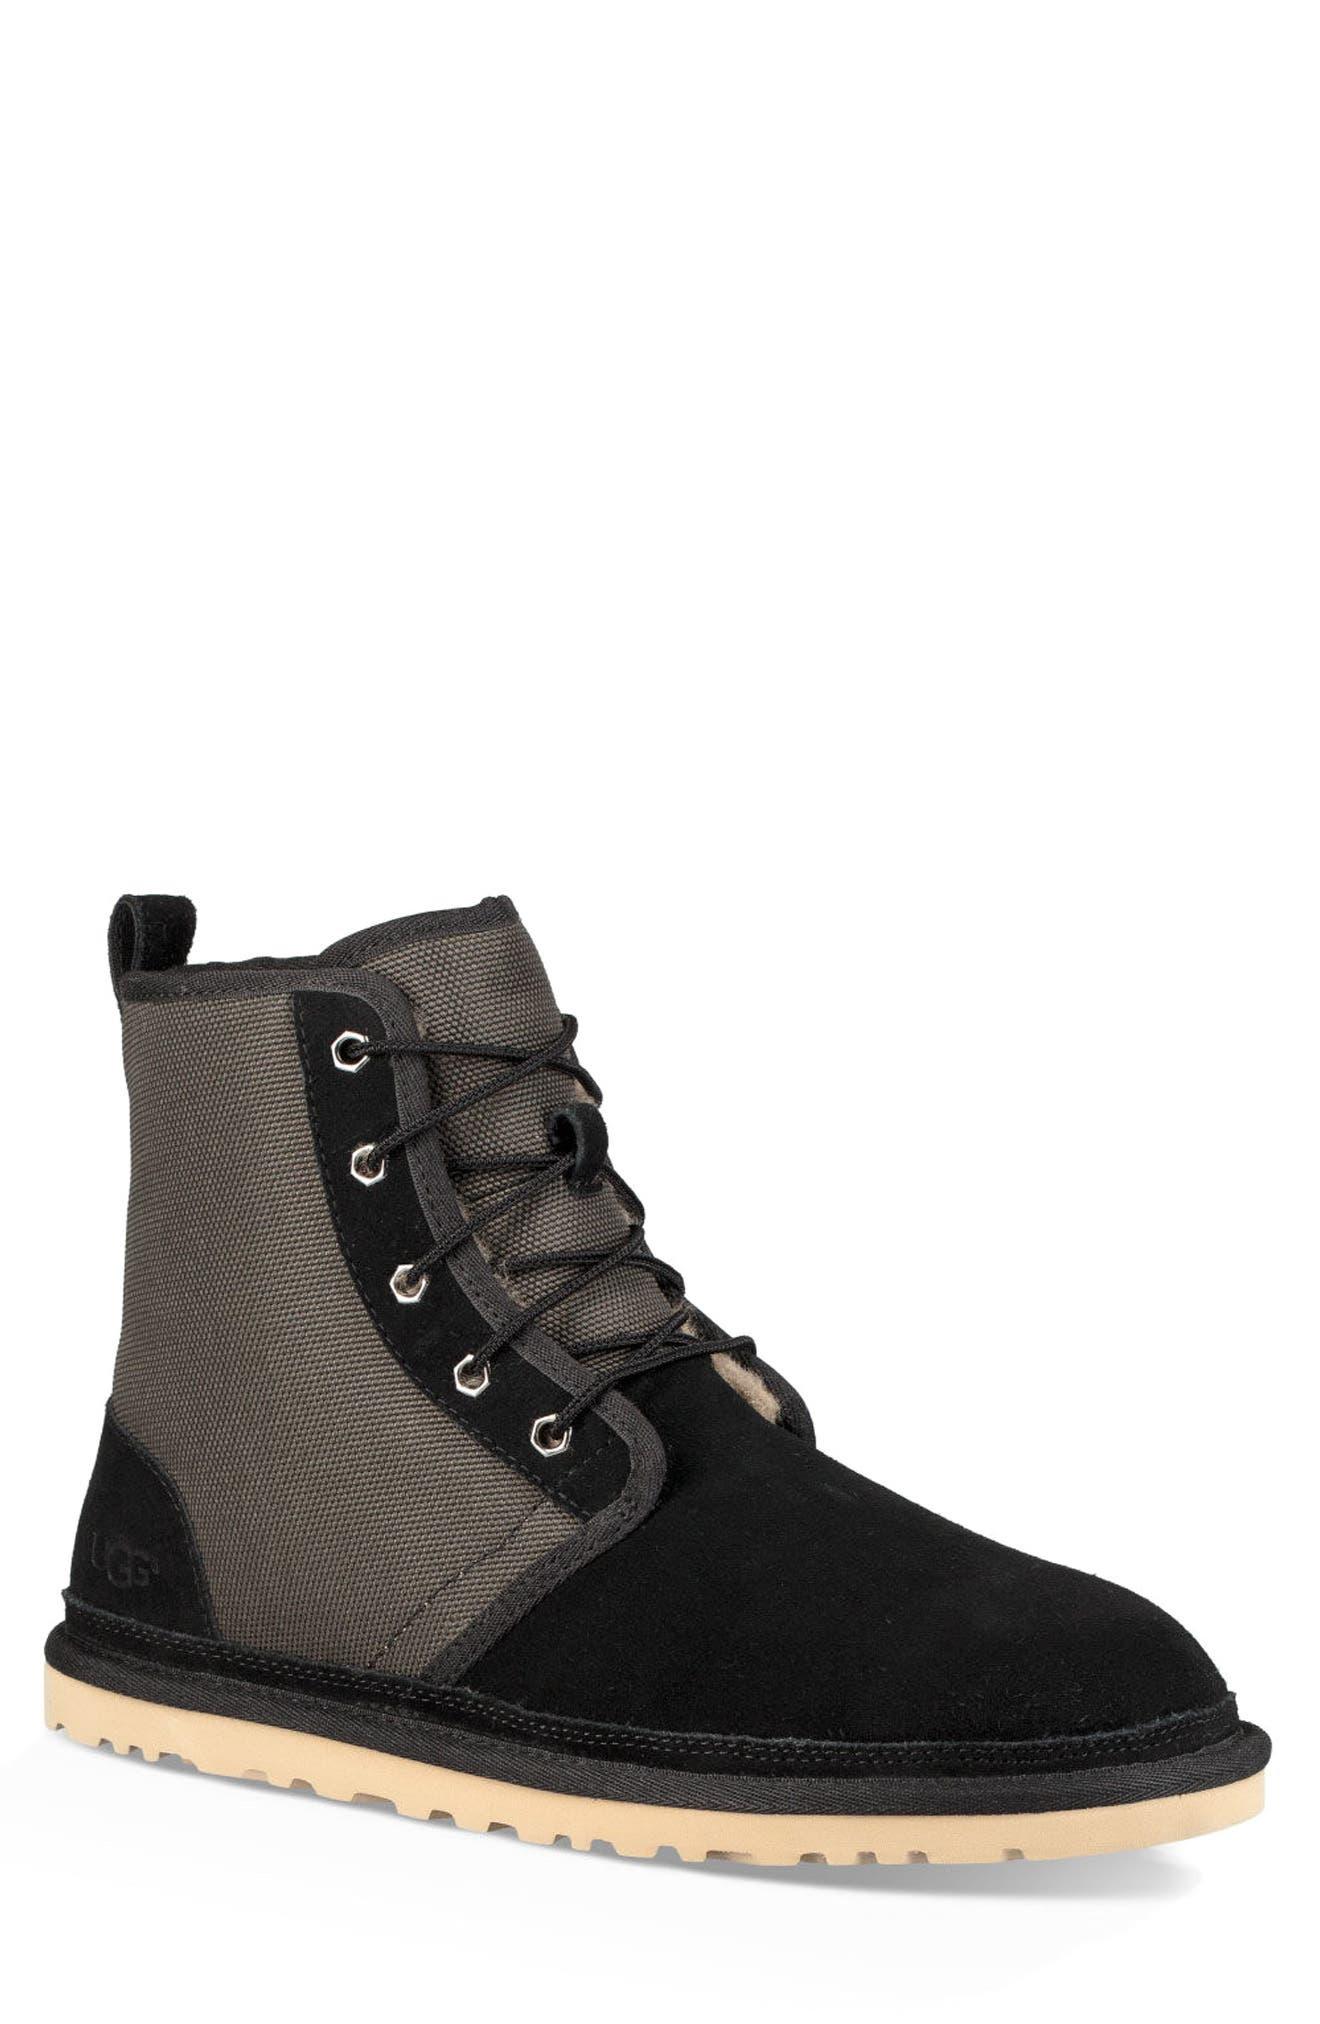 Harkley Lace-Up Boot,                             Main thumbnail 1, color,                             BLACK SUEDE